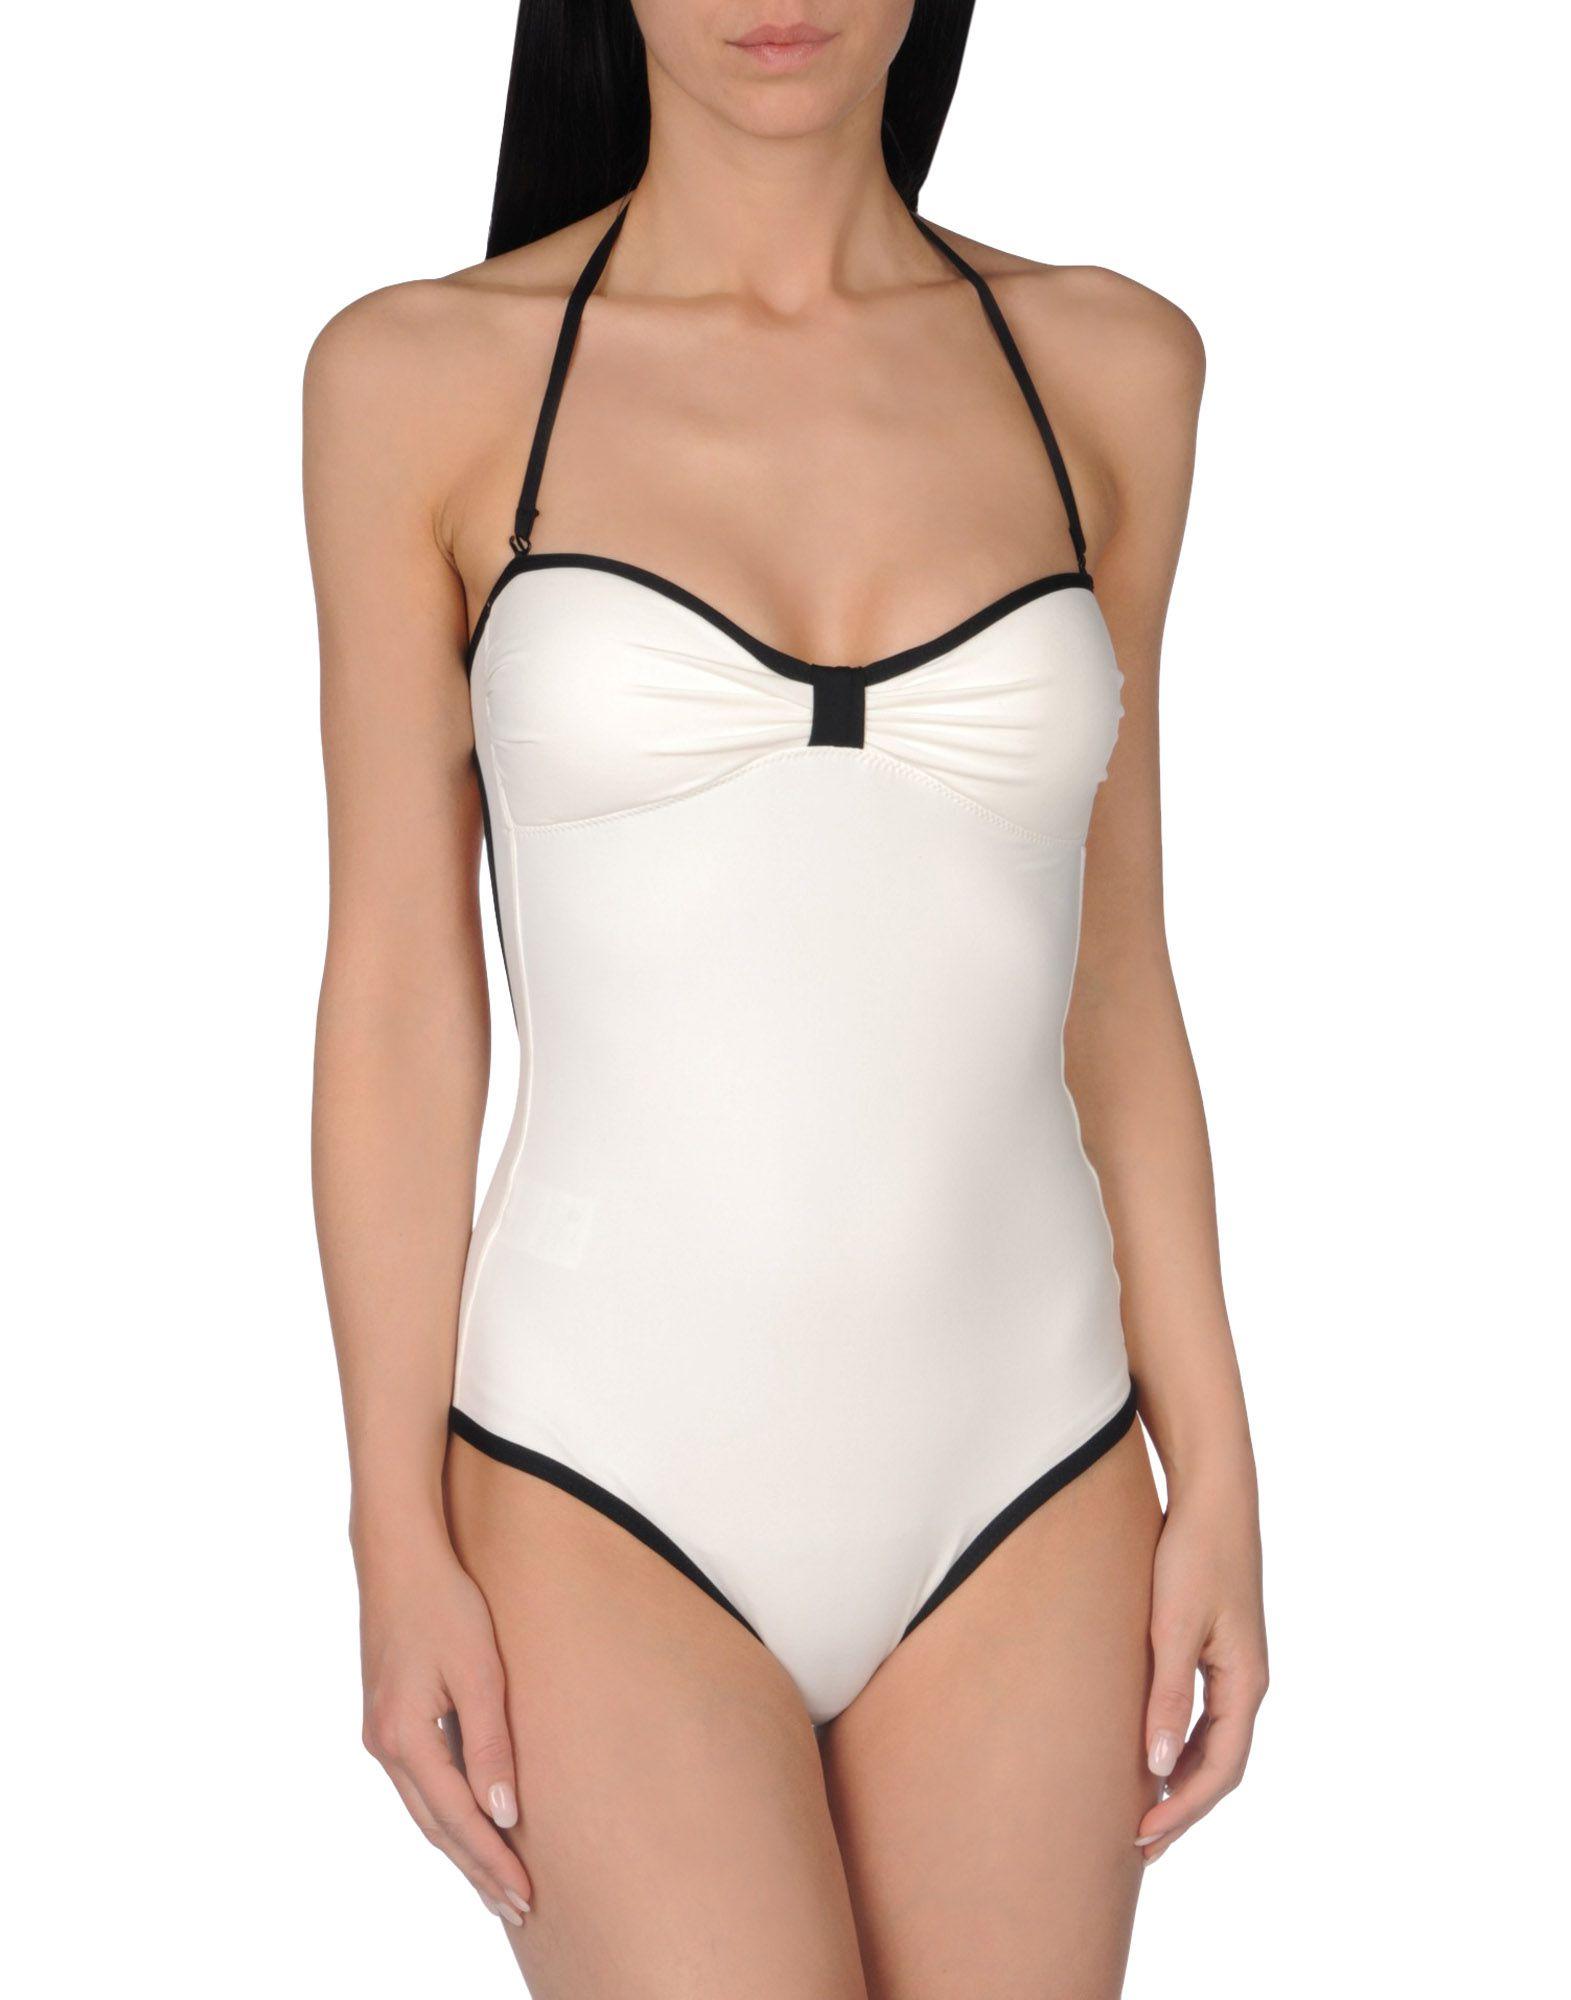 TOTON COMELLA - TCN Damen Badeanzug Farbe Weiß Größe 2